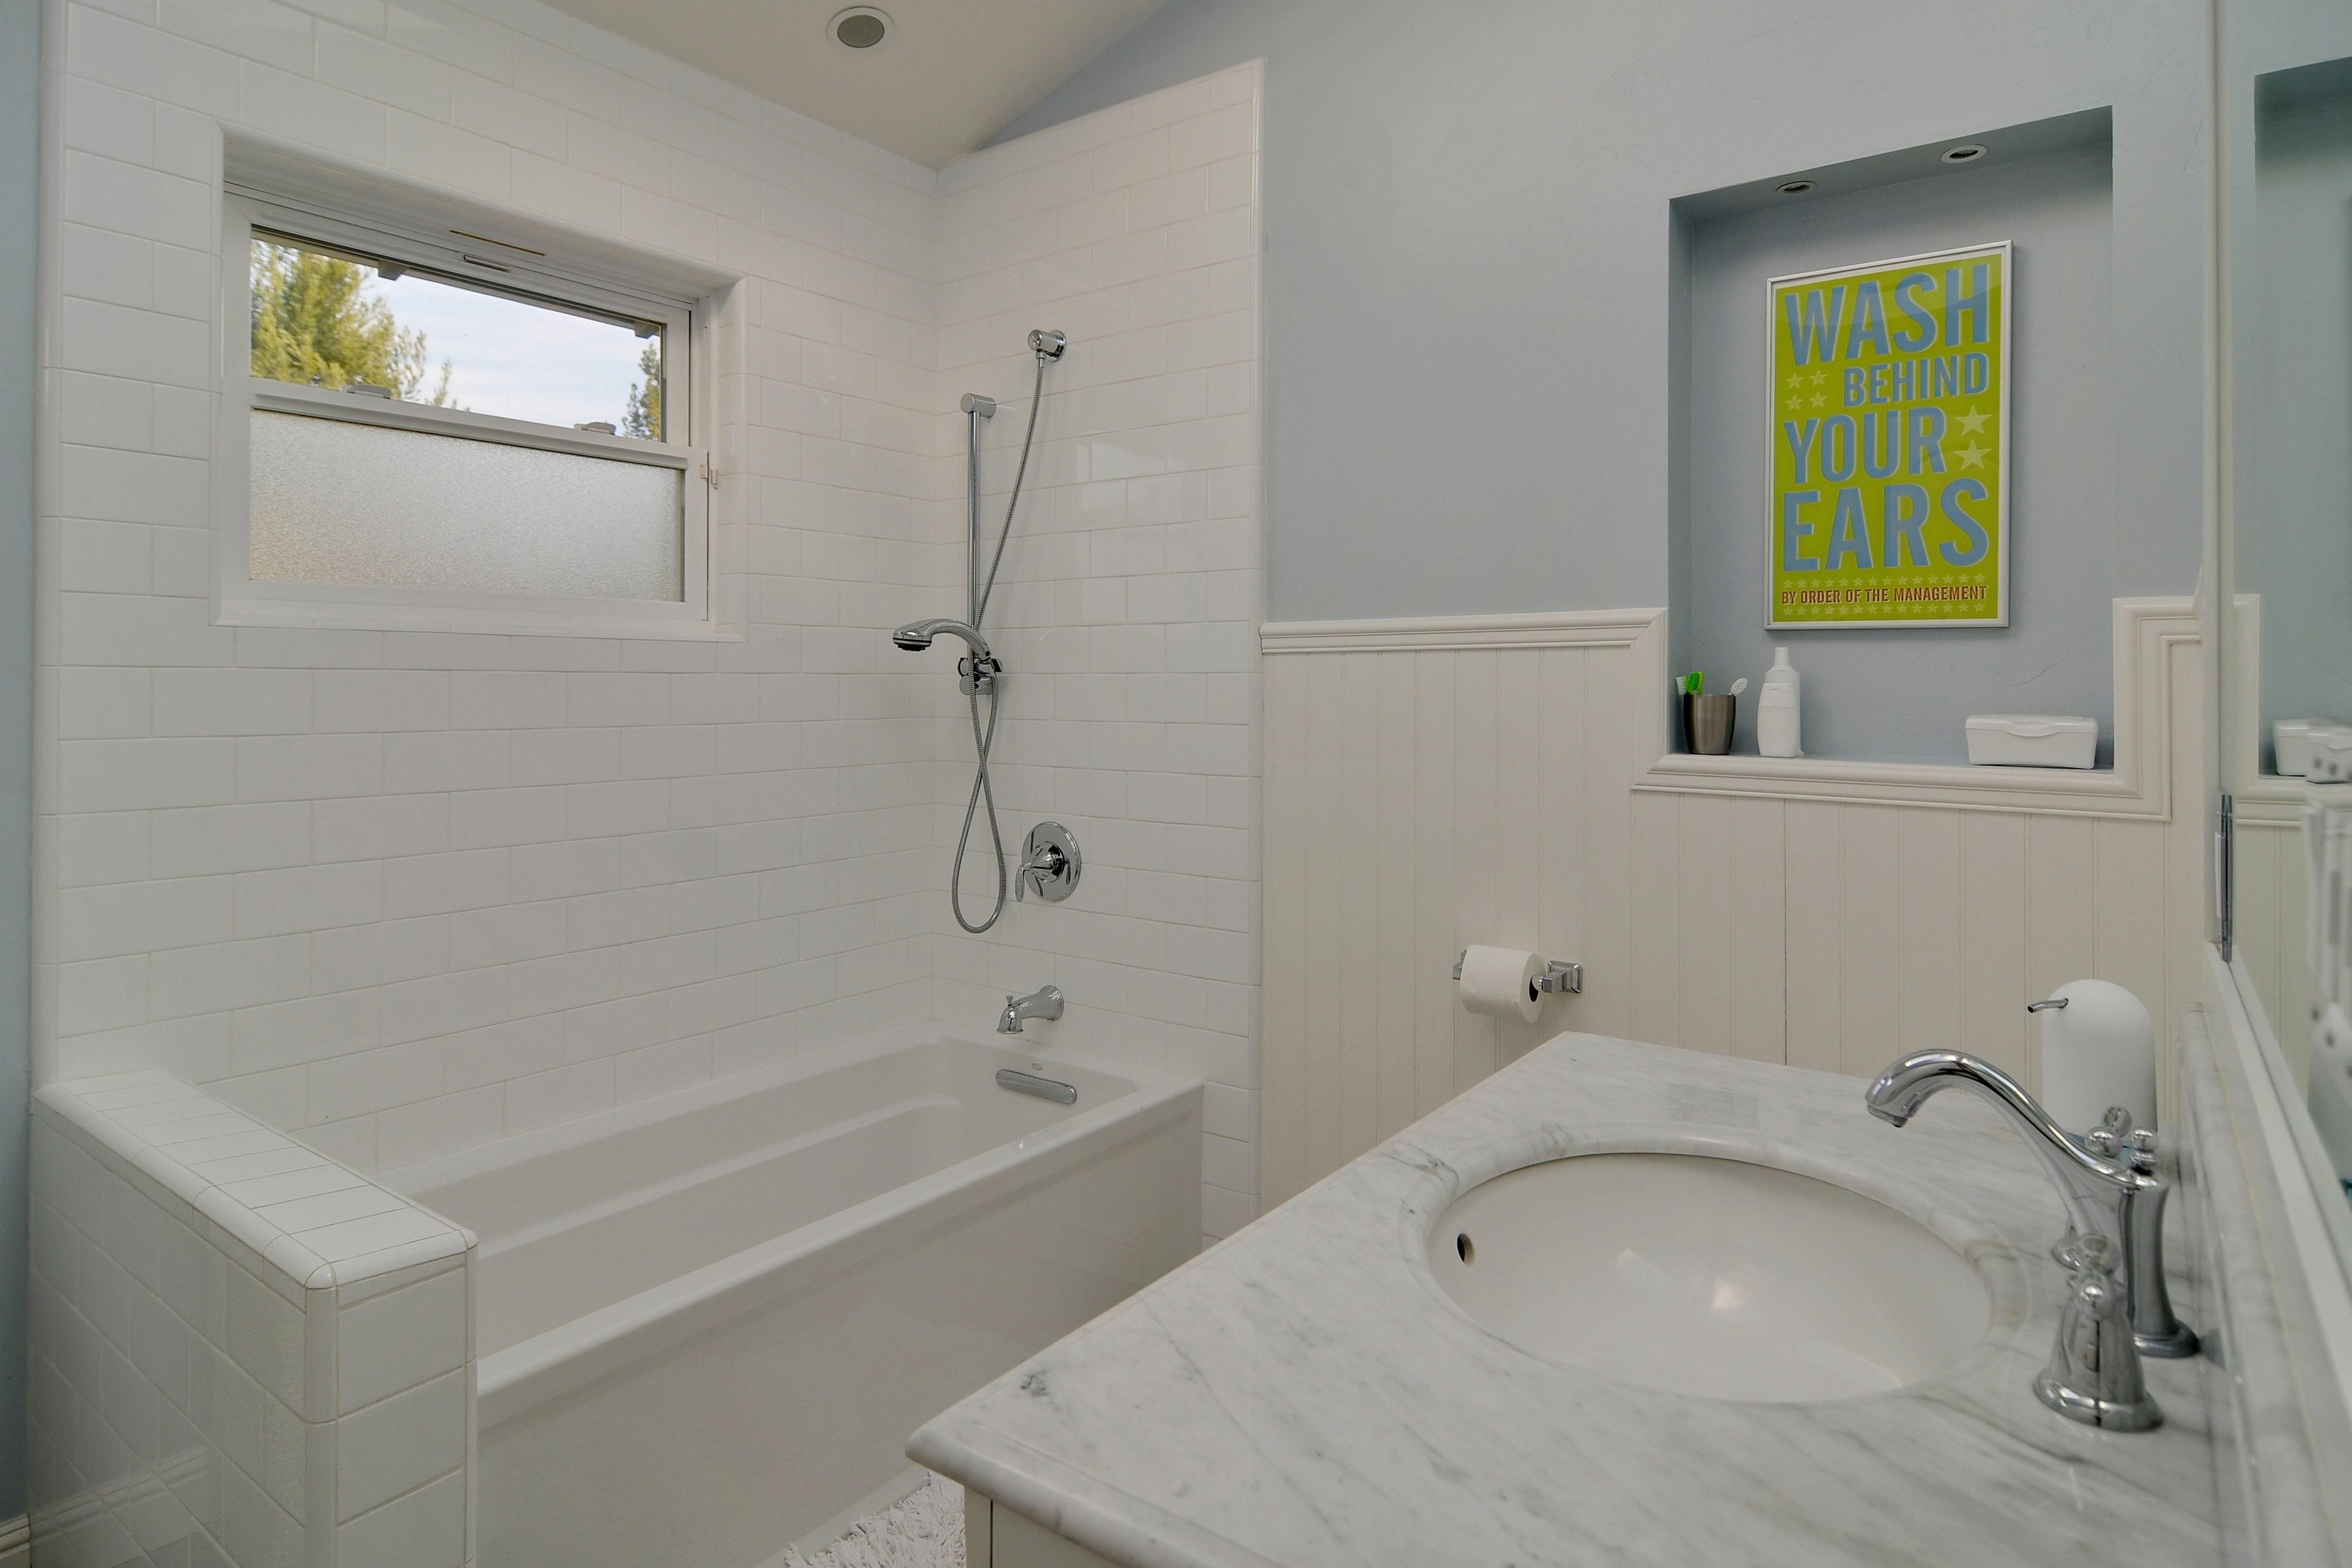 023 Hall Bathroom - Exquisite, expansive, remodeled Belwood home - 127 Belhaven Drive, Los Gatos